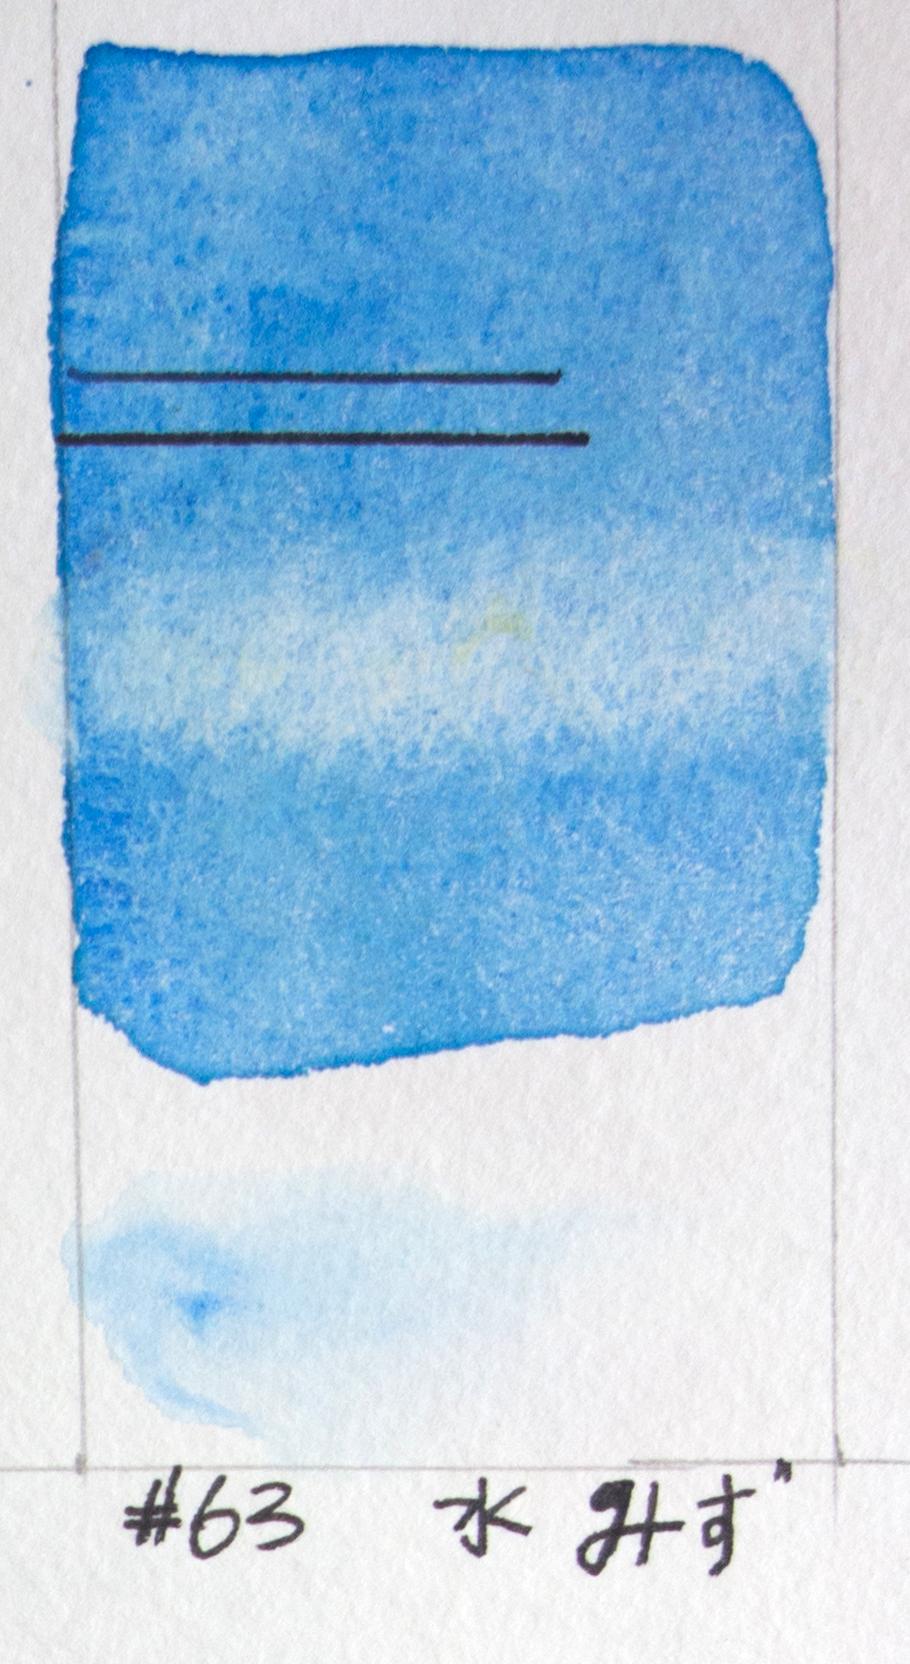 Kuretake Gansai Tambi- #63 水 Persian Blue